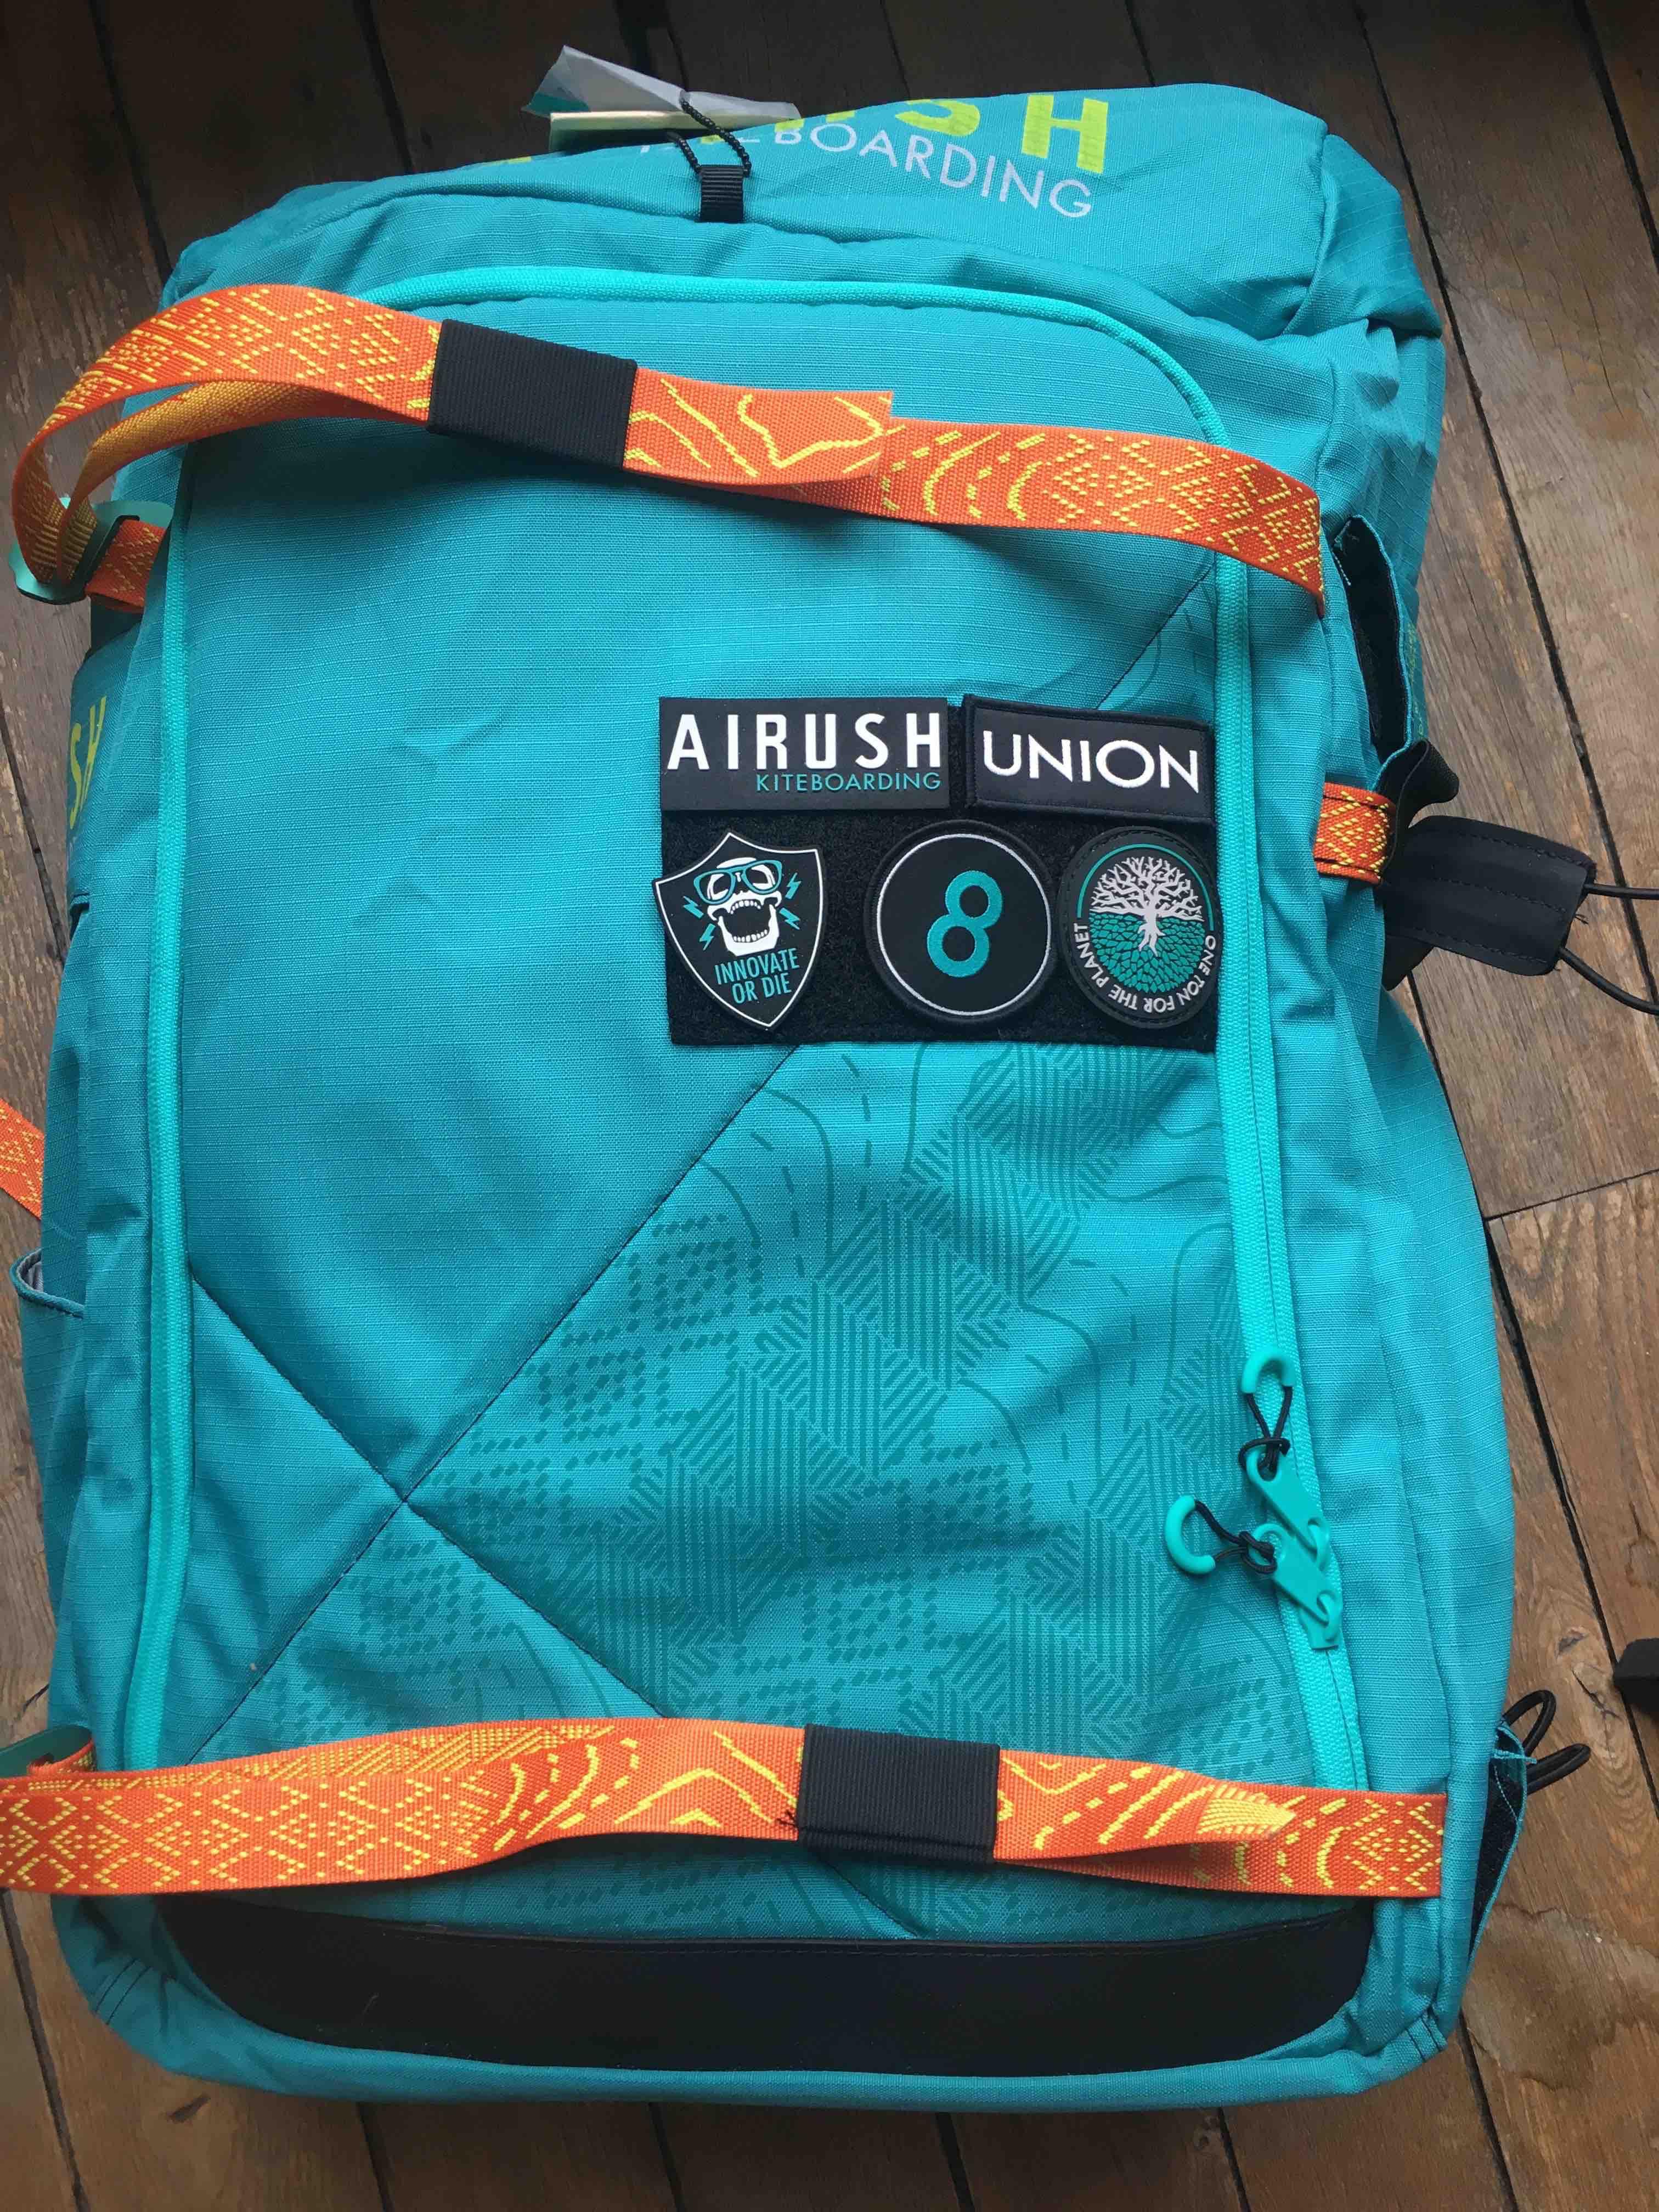 Sac Aile Kitesurf Airush Union III 2018 The Corner Shop